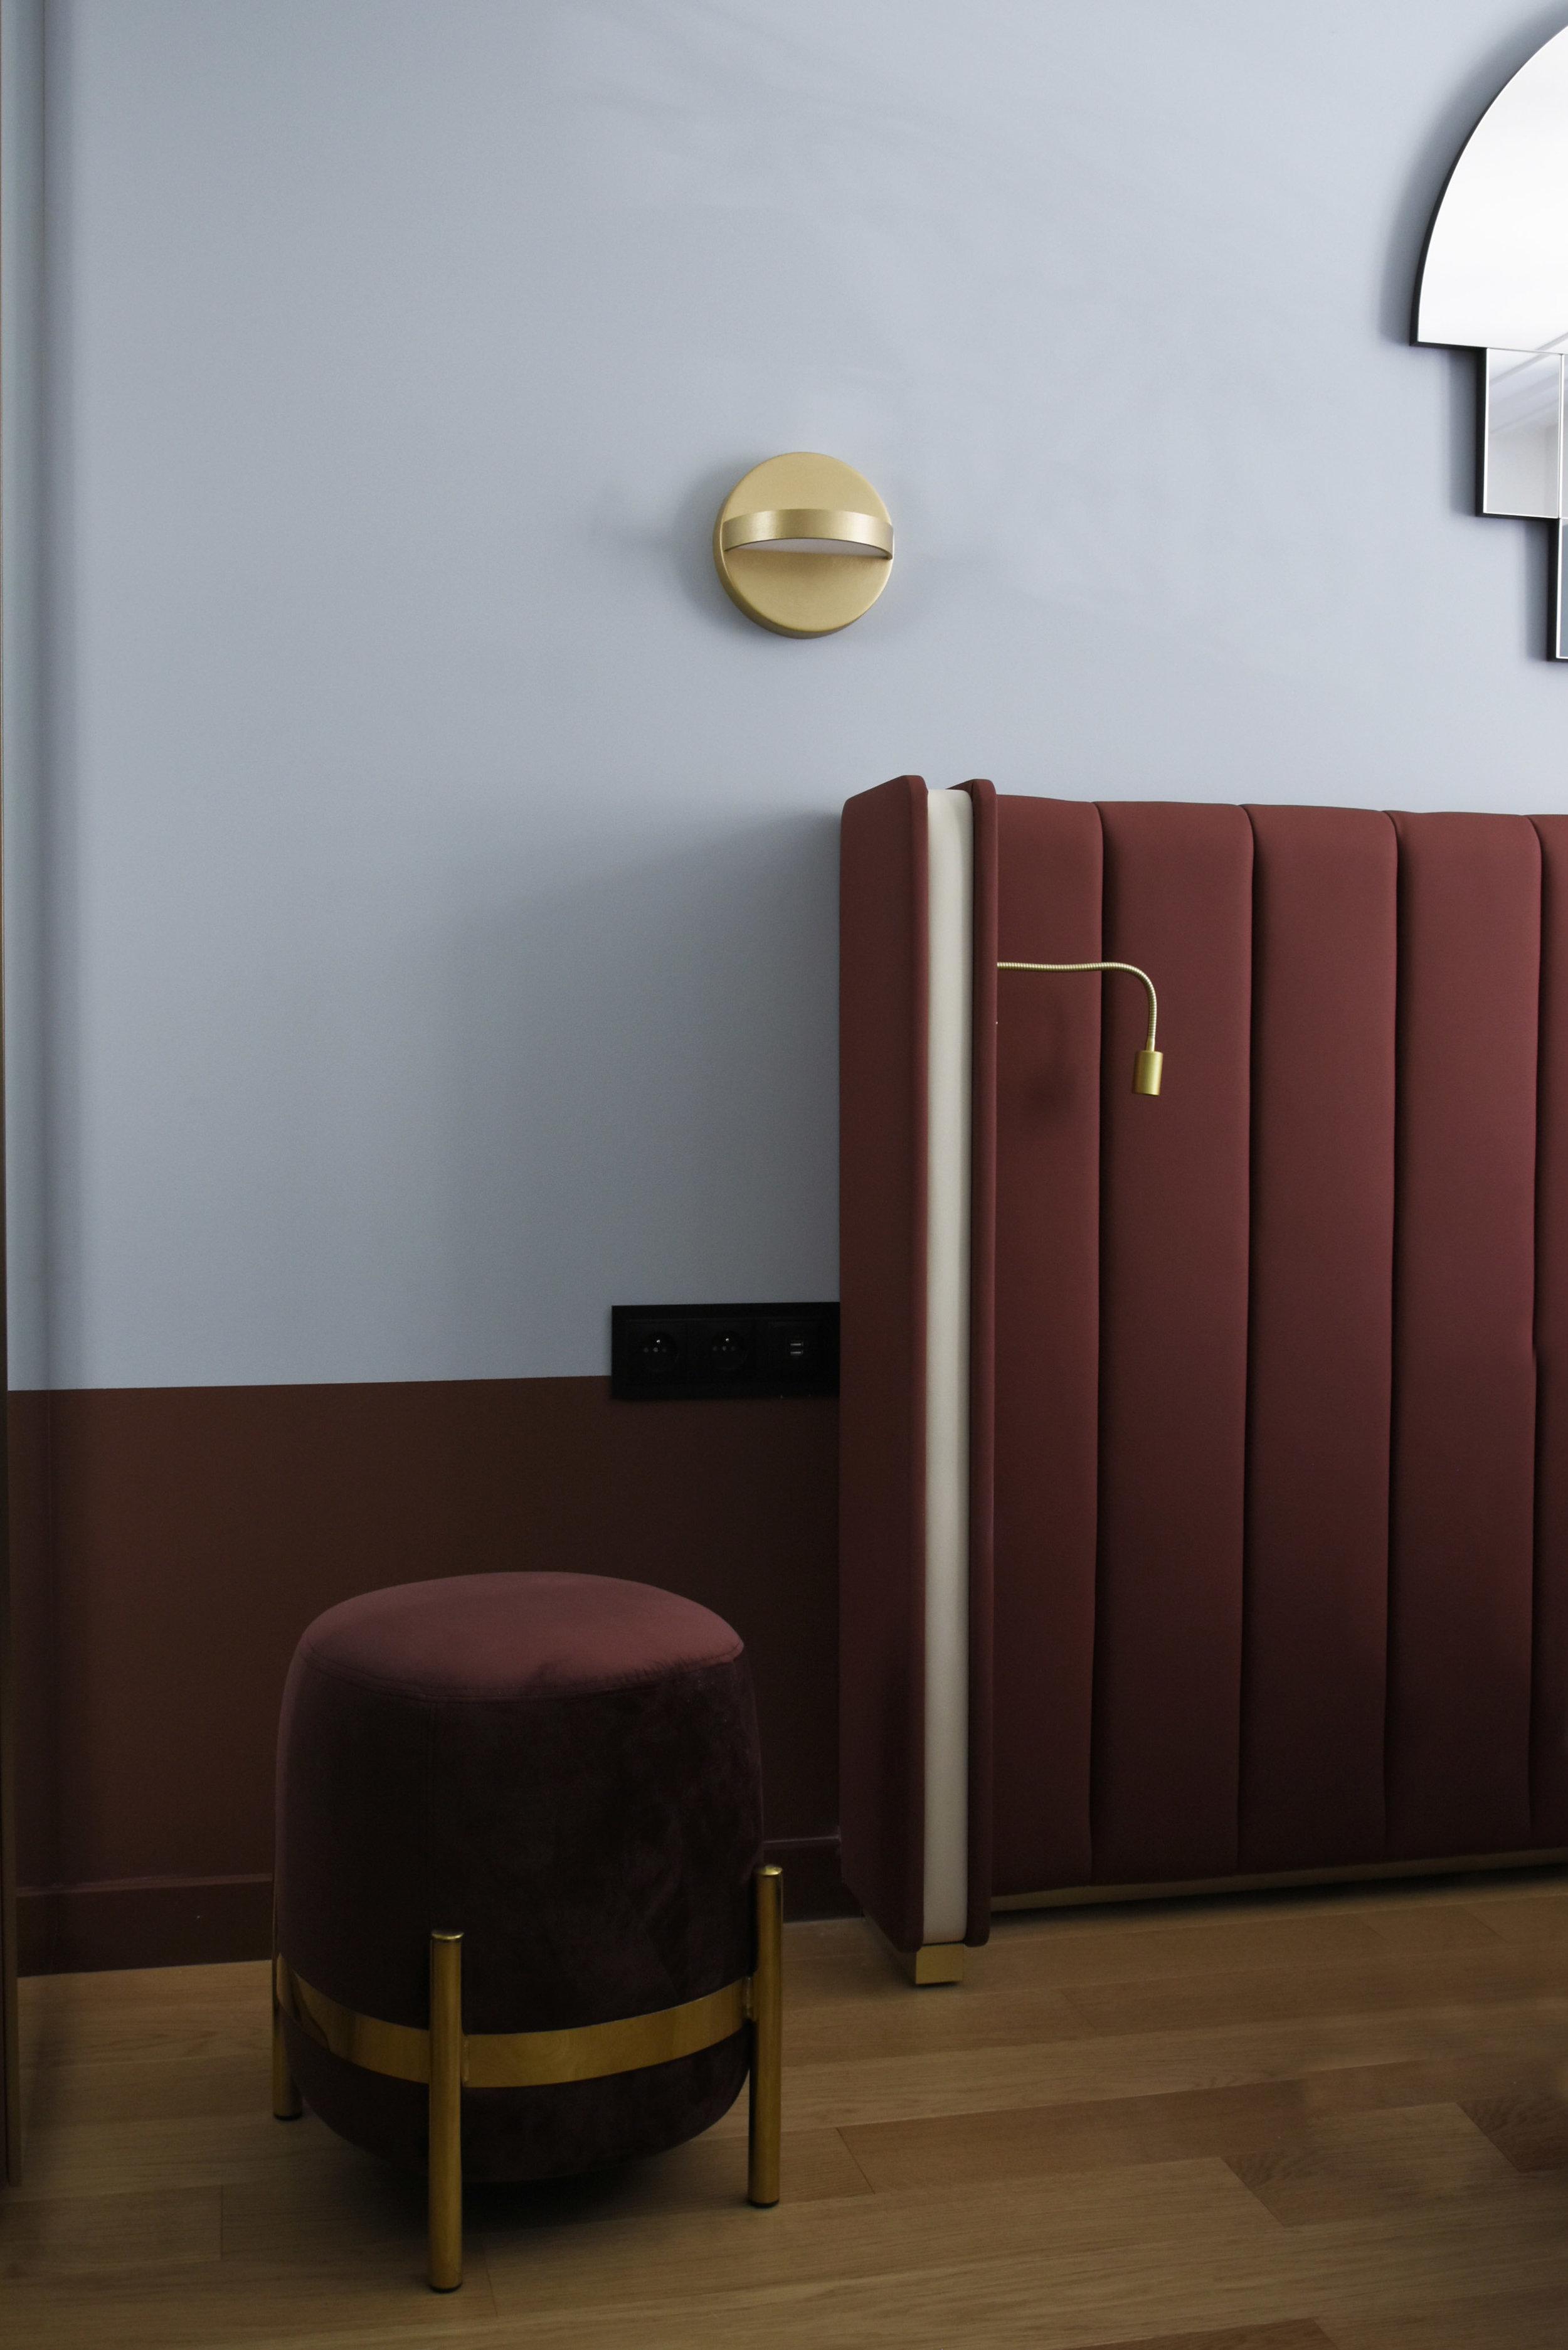 Hotel Parisianer / PLUS wall lamp & VEGA pouf